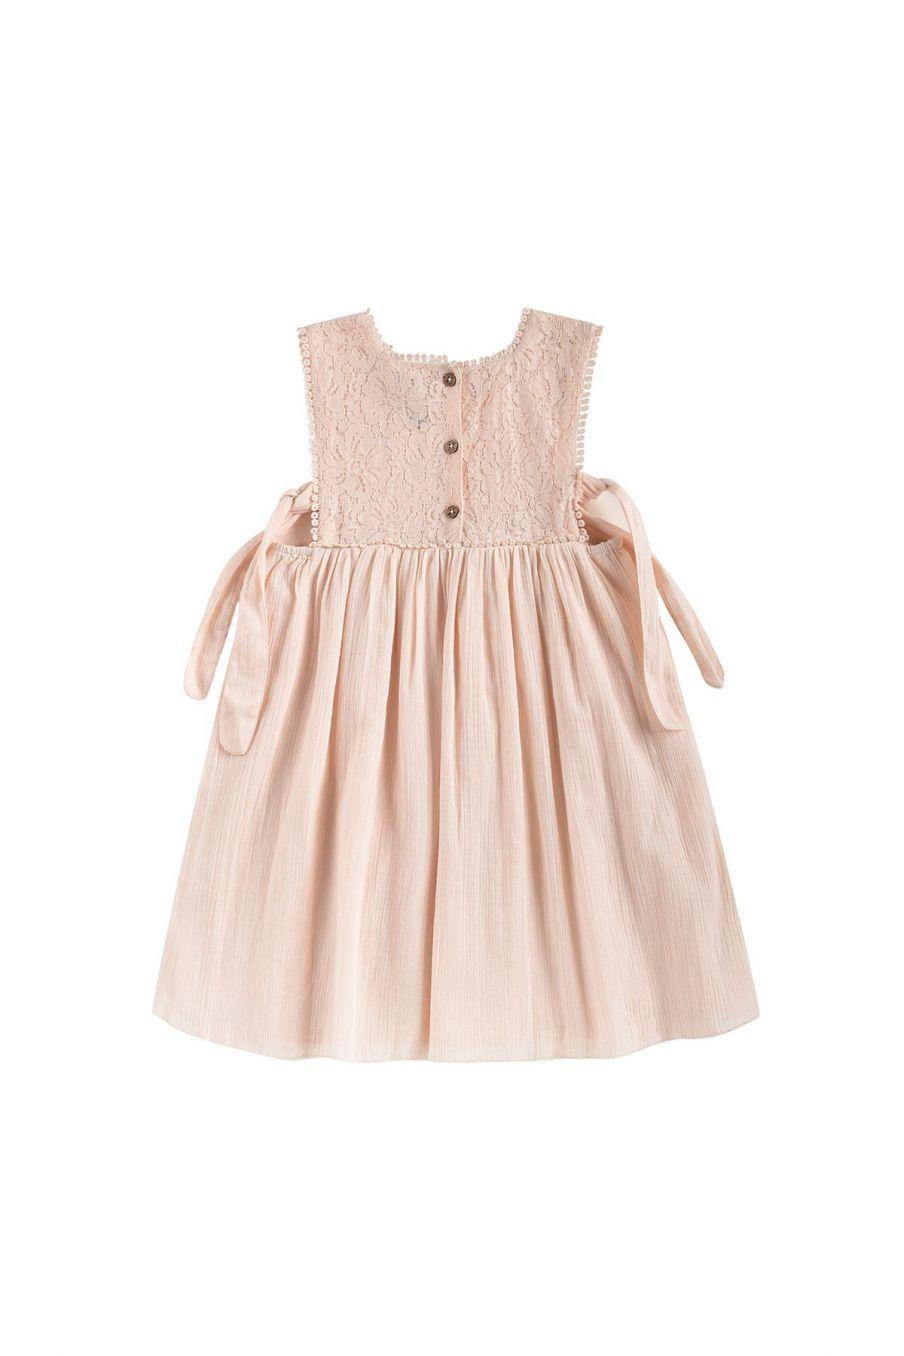 boheme chic vintage robe fille paolina blush